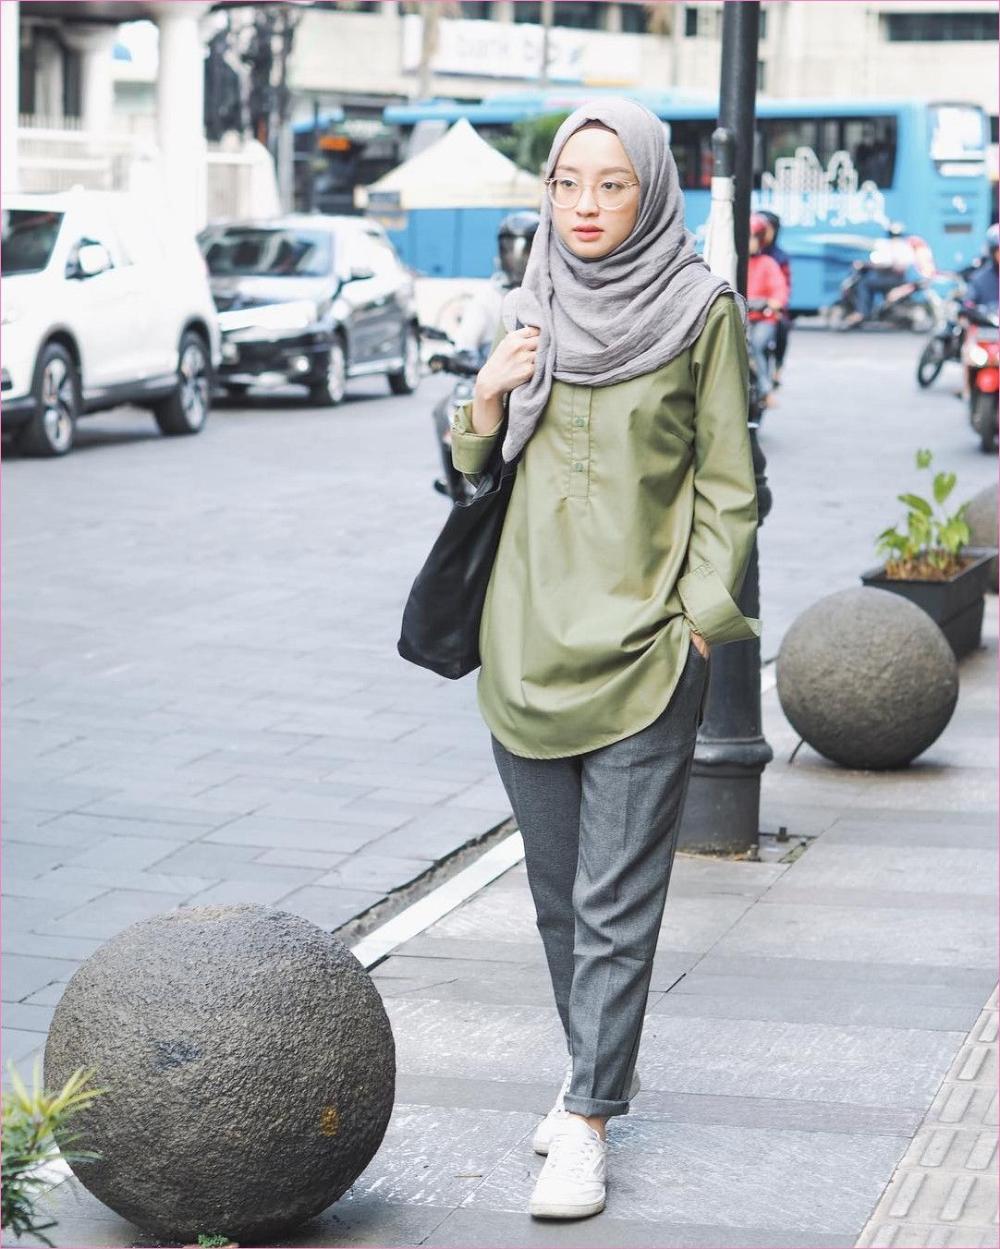 Magnificent Gaya Fashion Wanita Gemuk 59 Untuk Ide Gaya Menarik Pada Post Gaya Fashion Wanita Gemuk Casual Hijab Outfit Model Pakaian Hijab Kasual